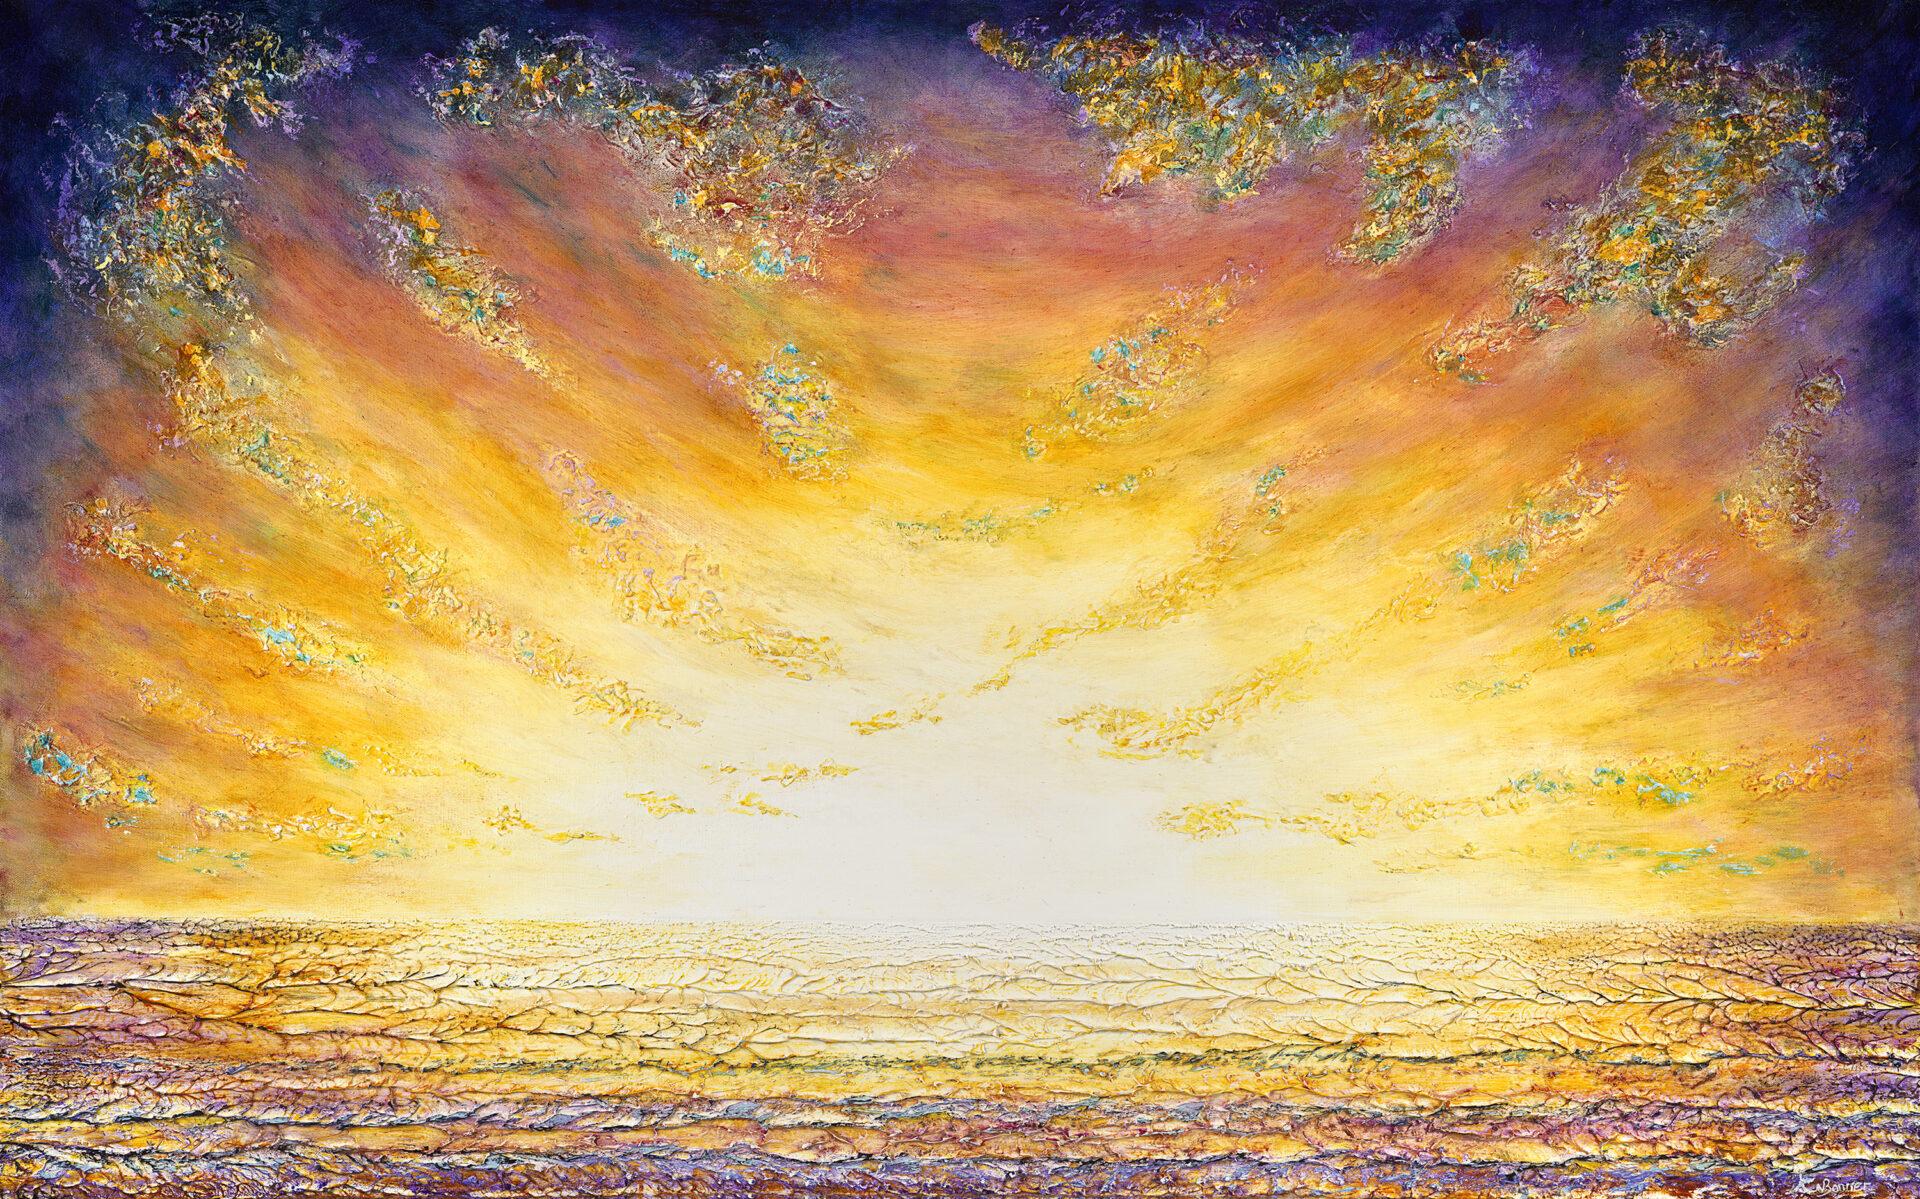 It's a kind of magic Seascape Ken Bonner original oil painting Santa Fe New Mexico